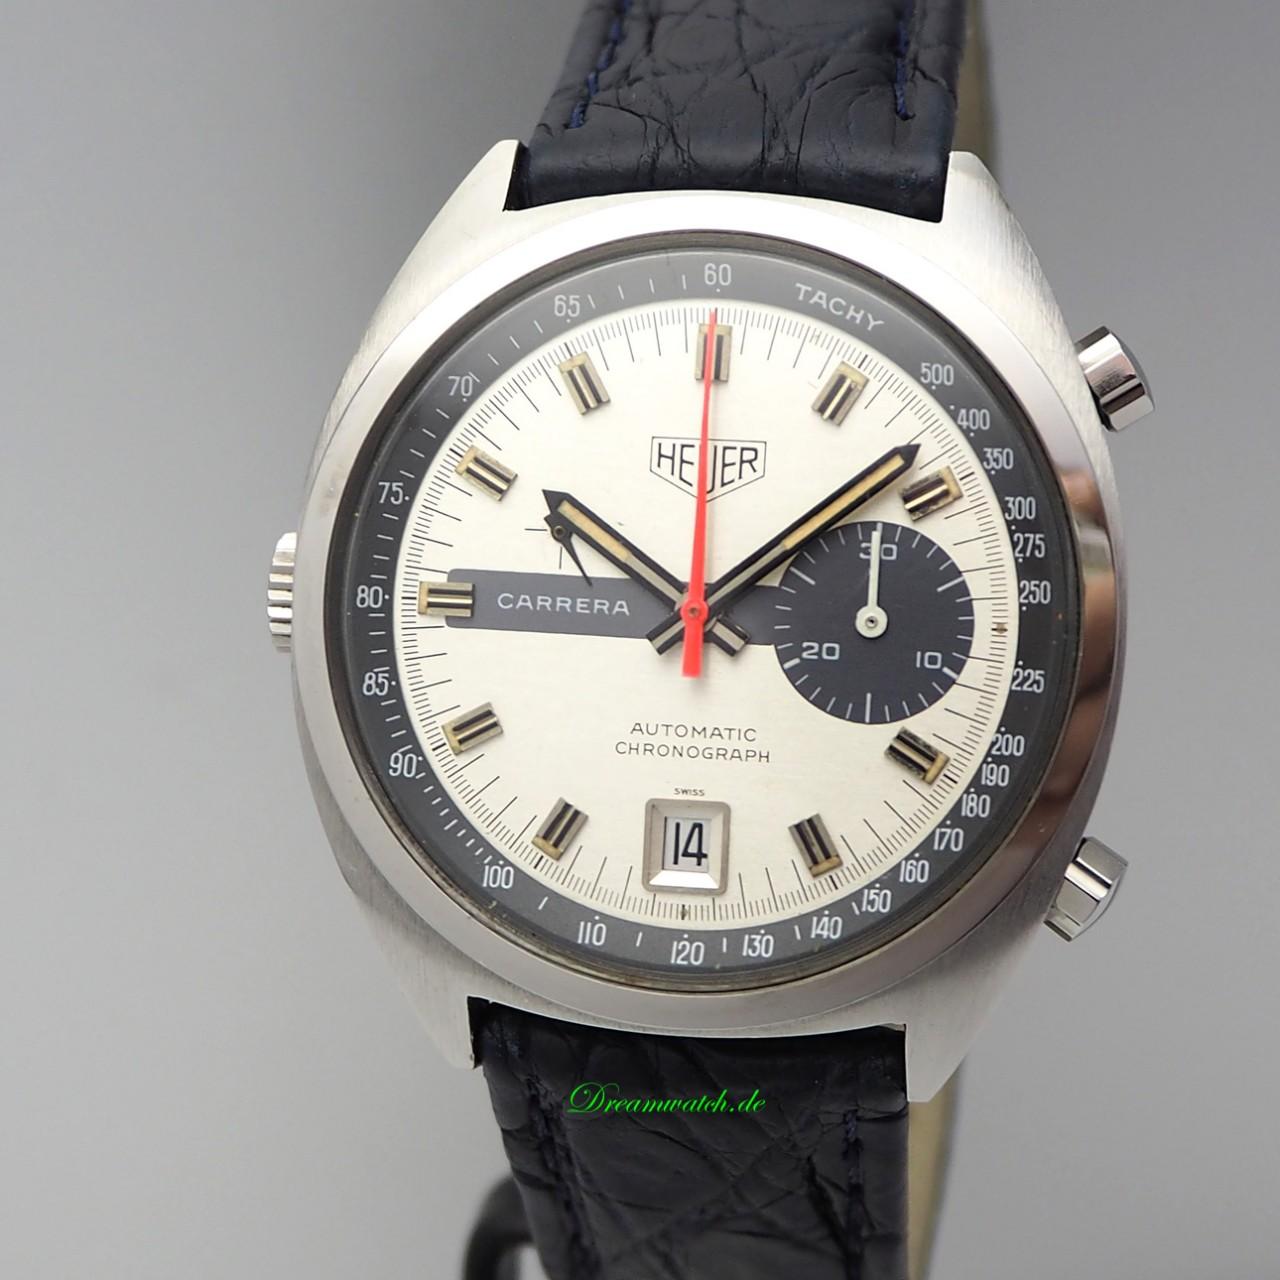 Heuer Carrera Vintage Chronograph Ref.: 1153 Cal.15 +Heuer Box